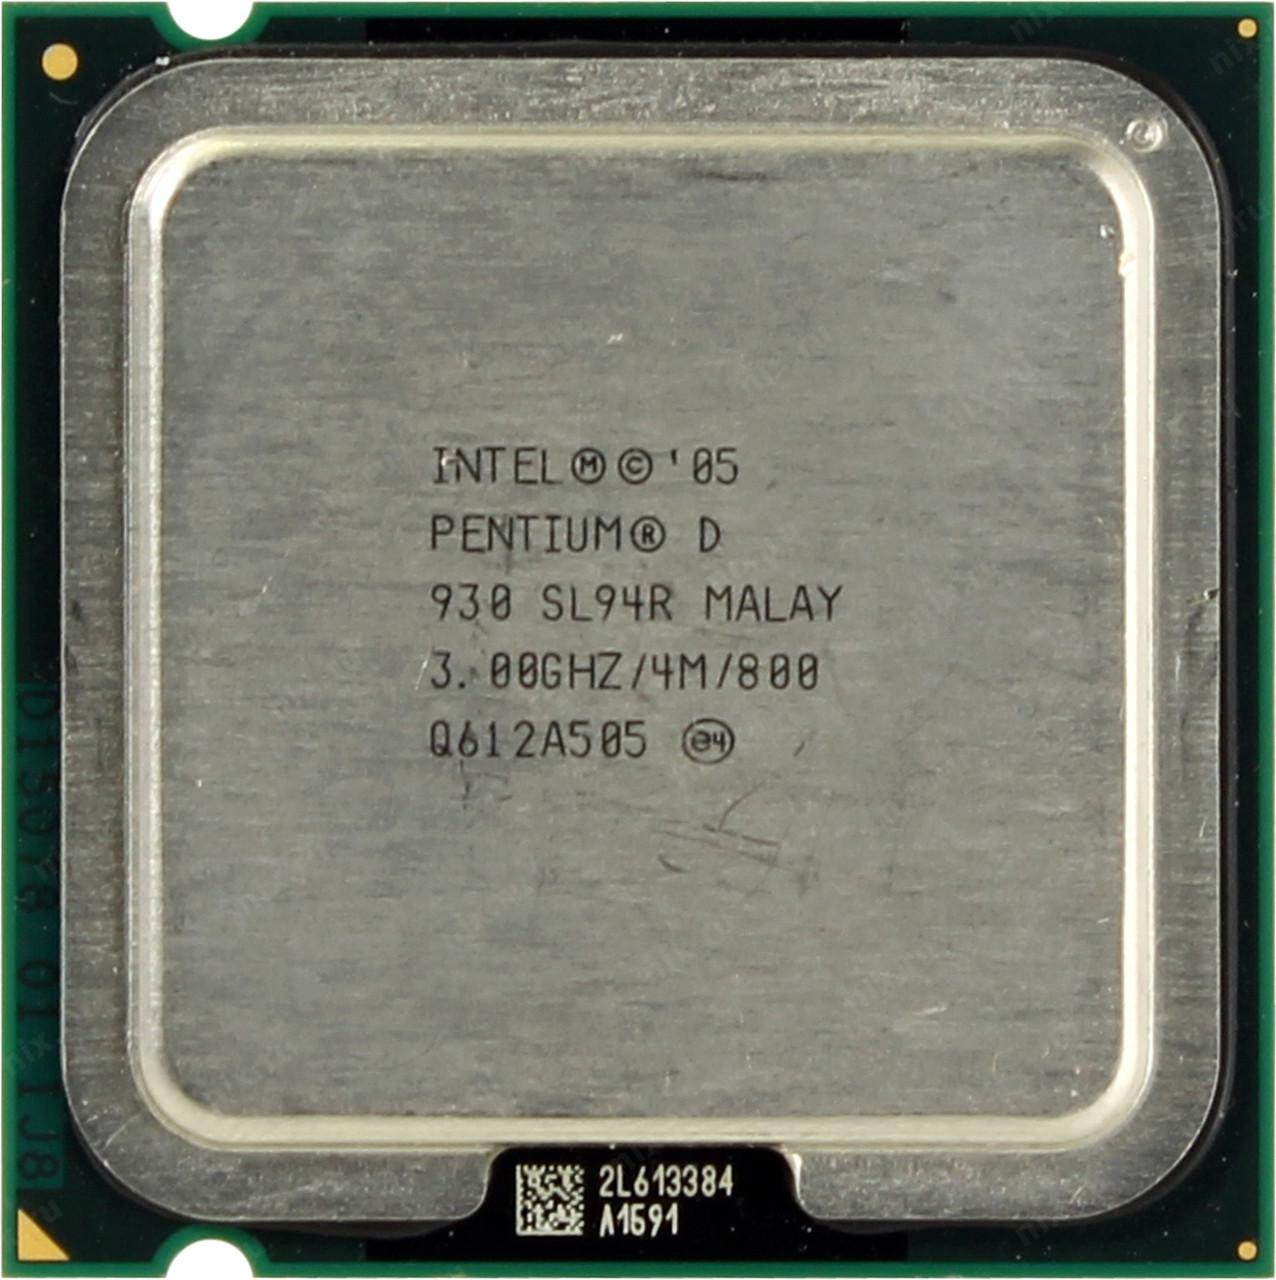 Процессор Intel Pentium D 930 3.00GHz/4M/800 (SL94R) s775, tray